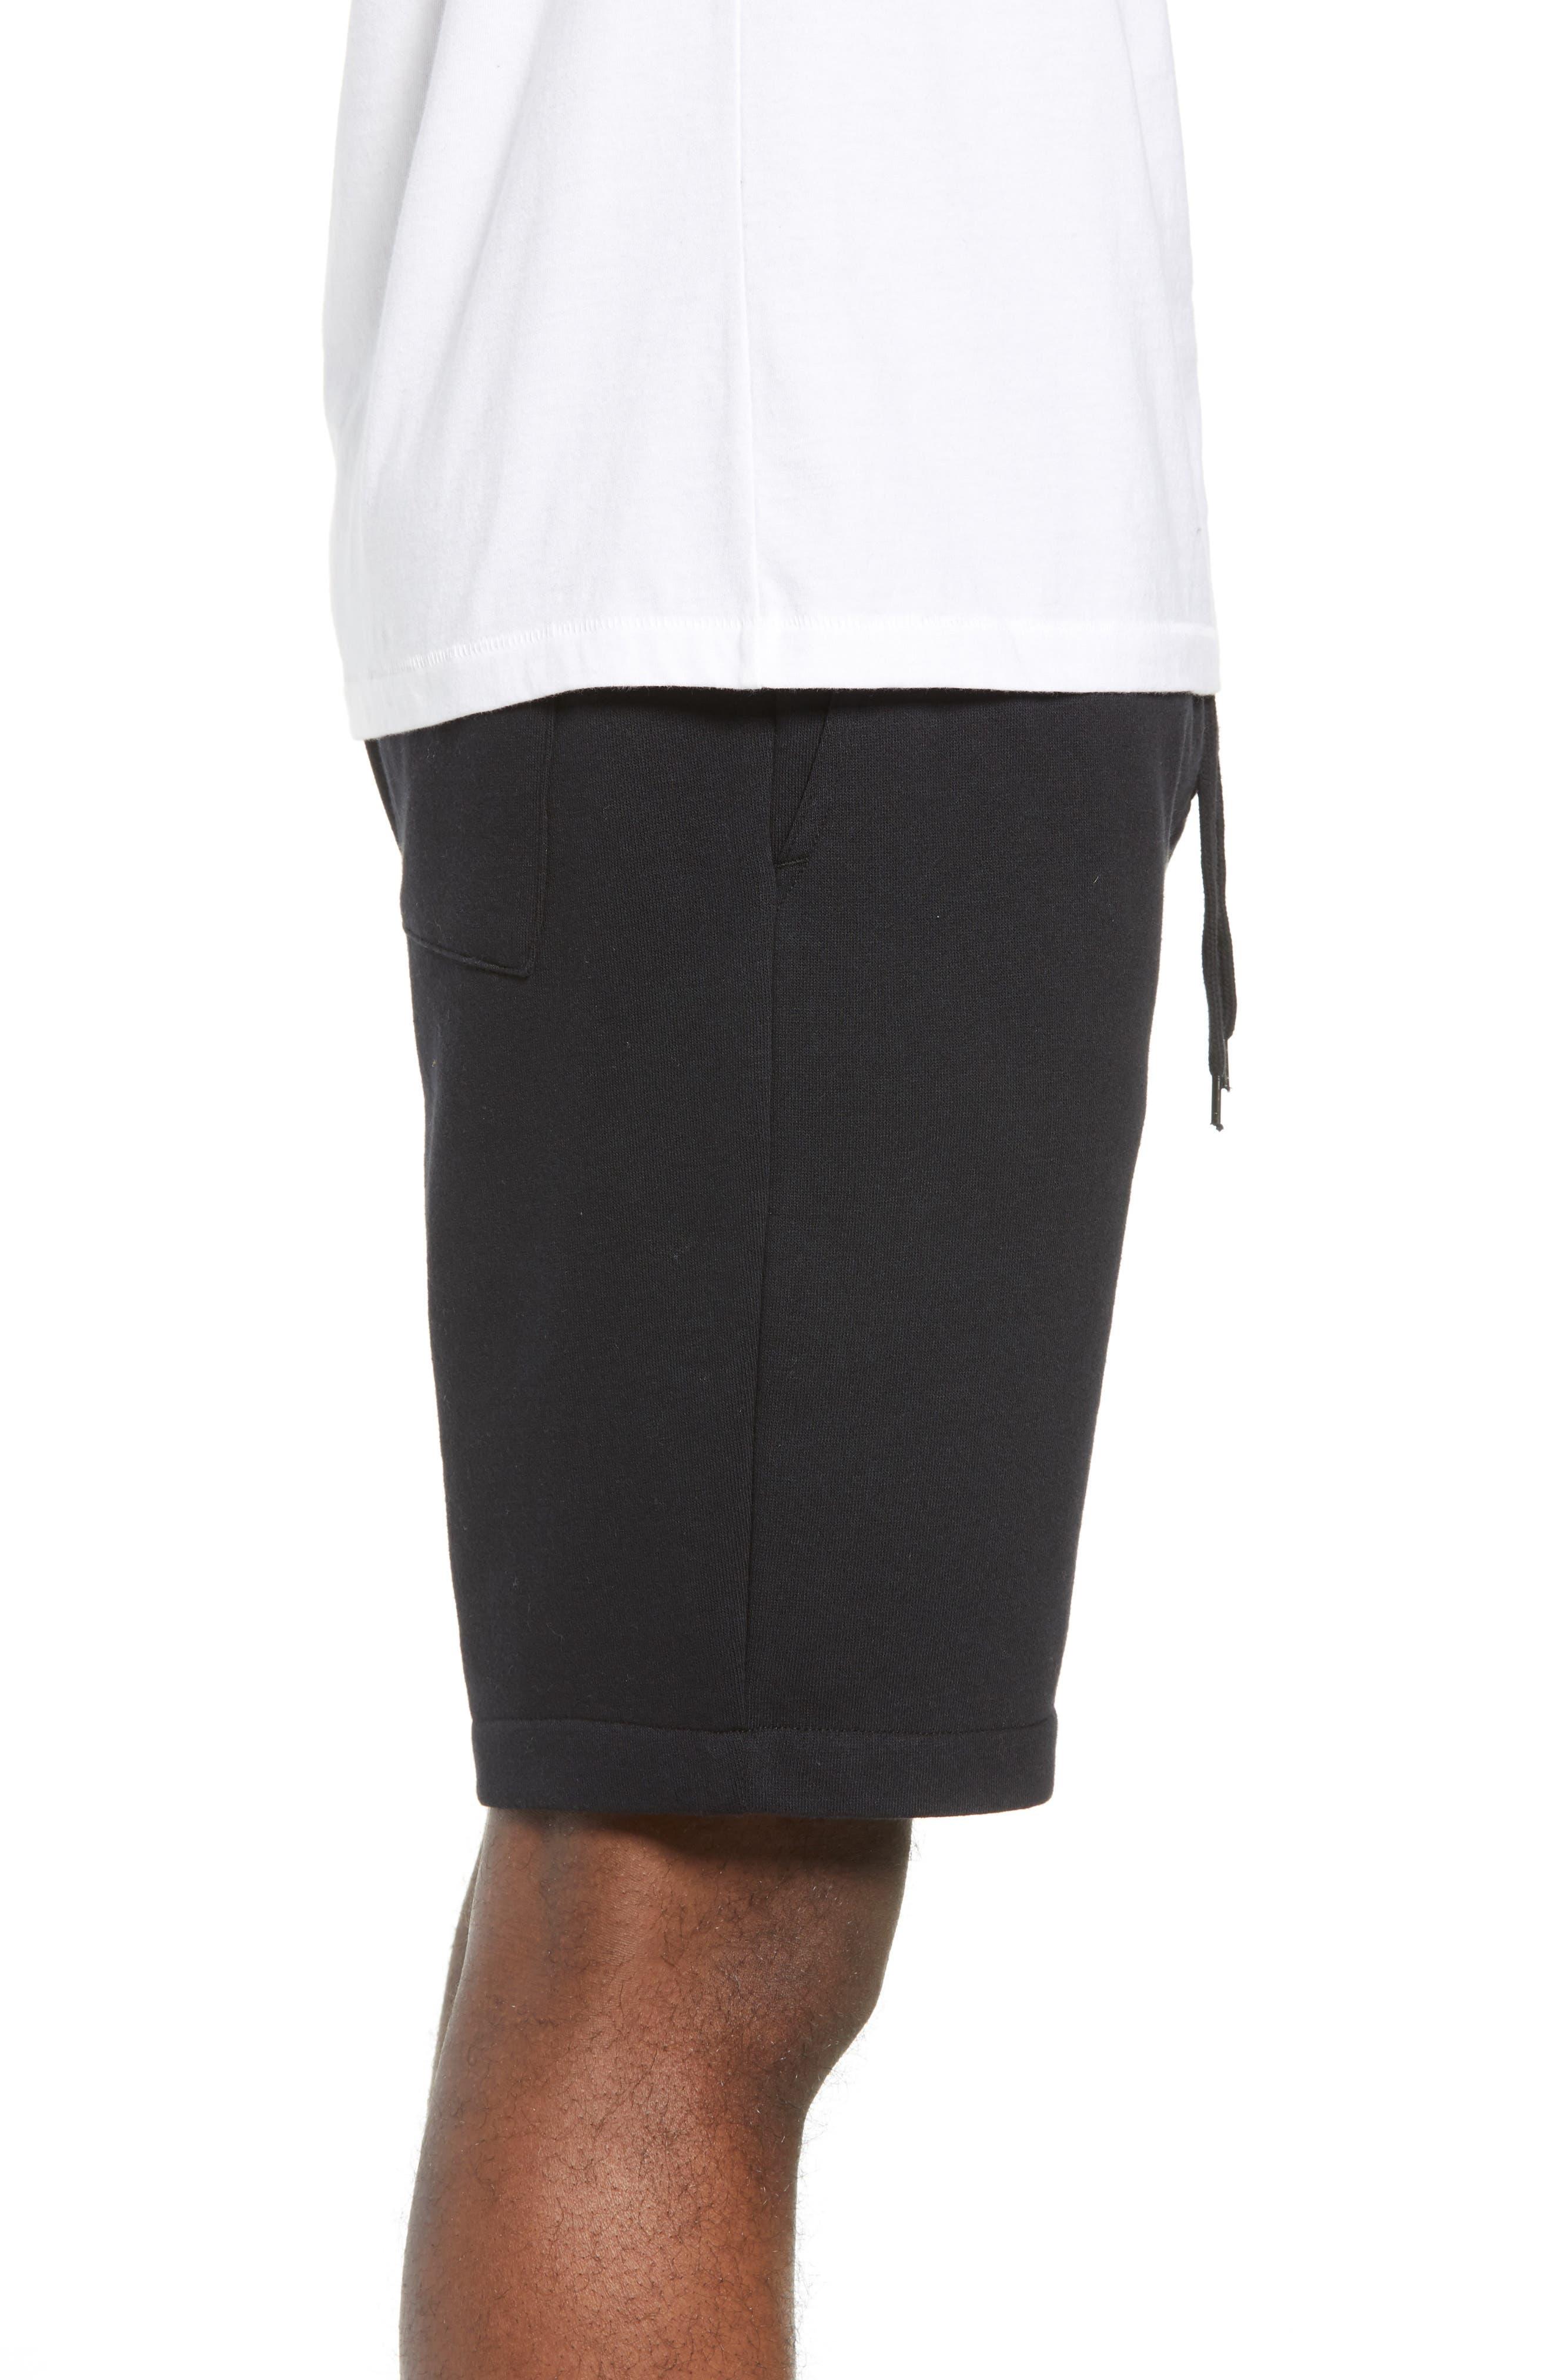 THE RAIL,                             Fleece Shorts,                             Alternate thumbnail 3, color,                             001